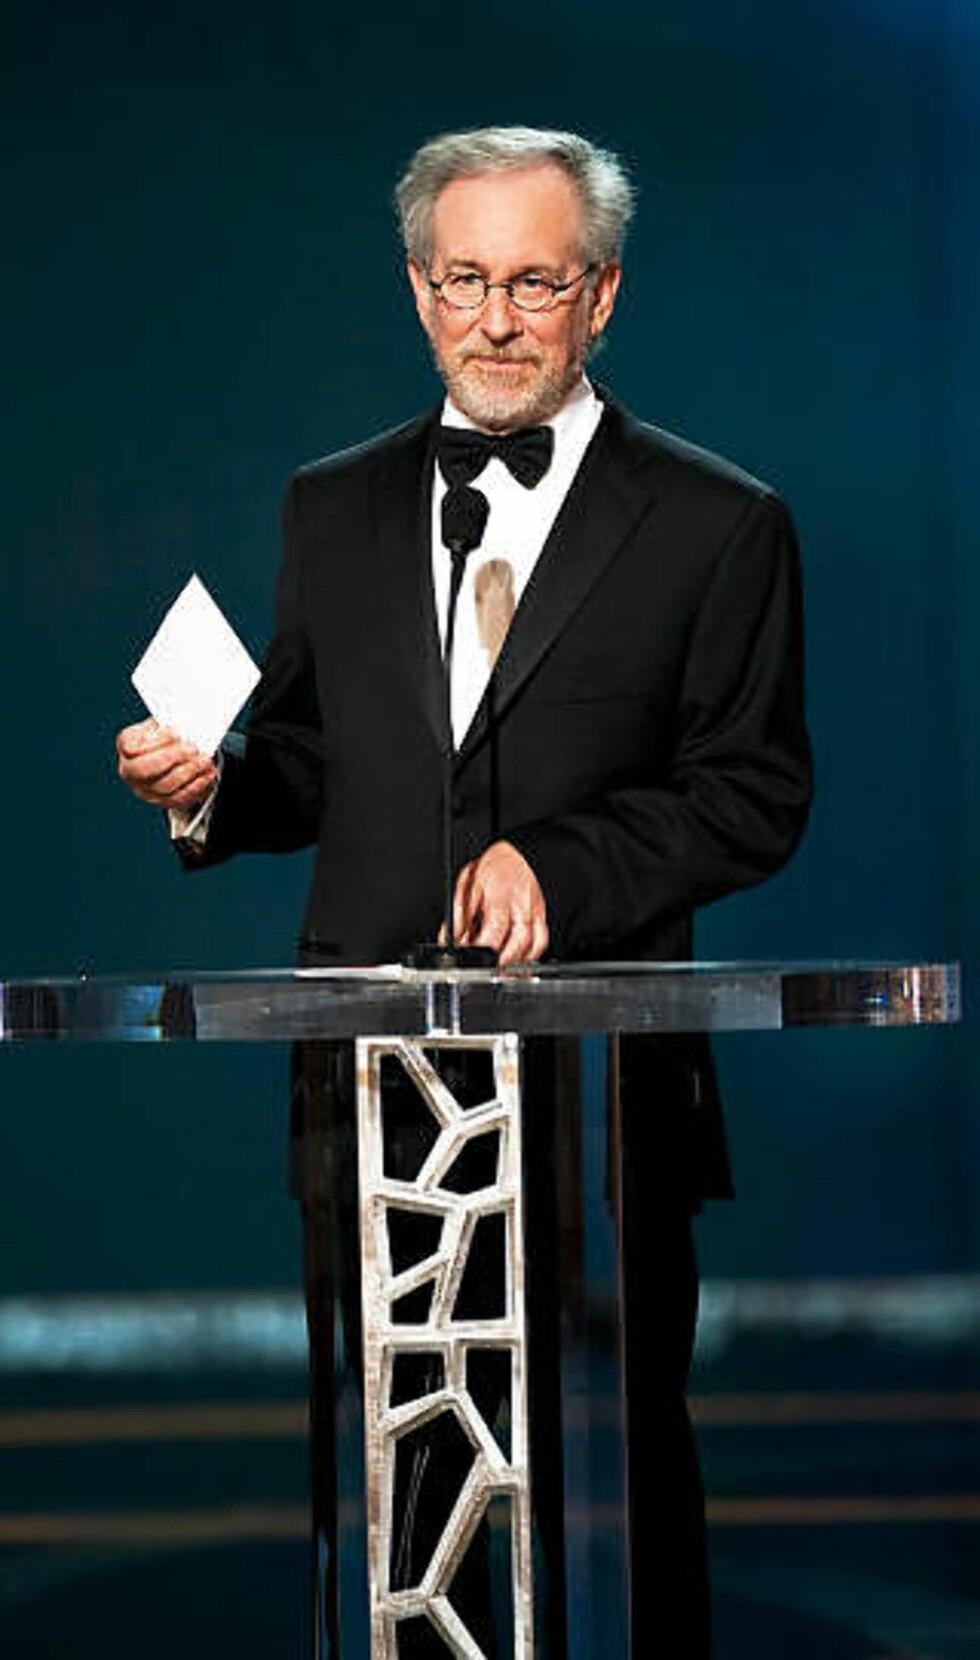 KUNDE: Steven Spielberg er blant de mange som betrodde Madoff sparepengene sine. Mange, blant dem nobelprisvinner Eli Wiesel og kona, har mistet alle sparepengene sine. Foto: PETER YADA/EPA/SCANPIX